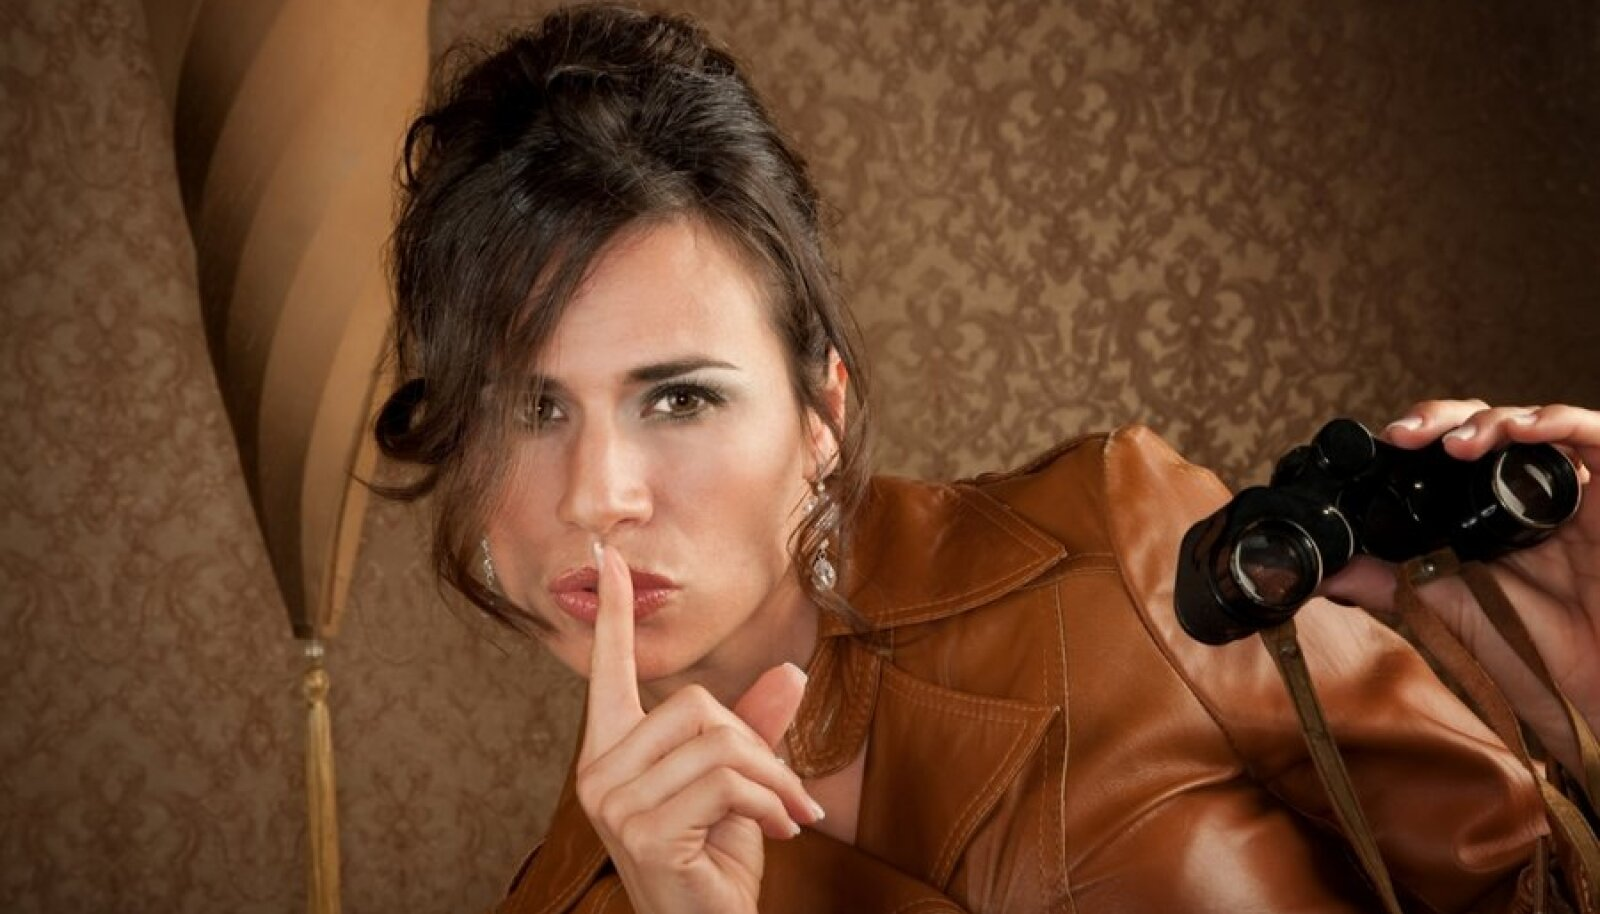 naine, saladus